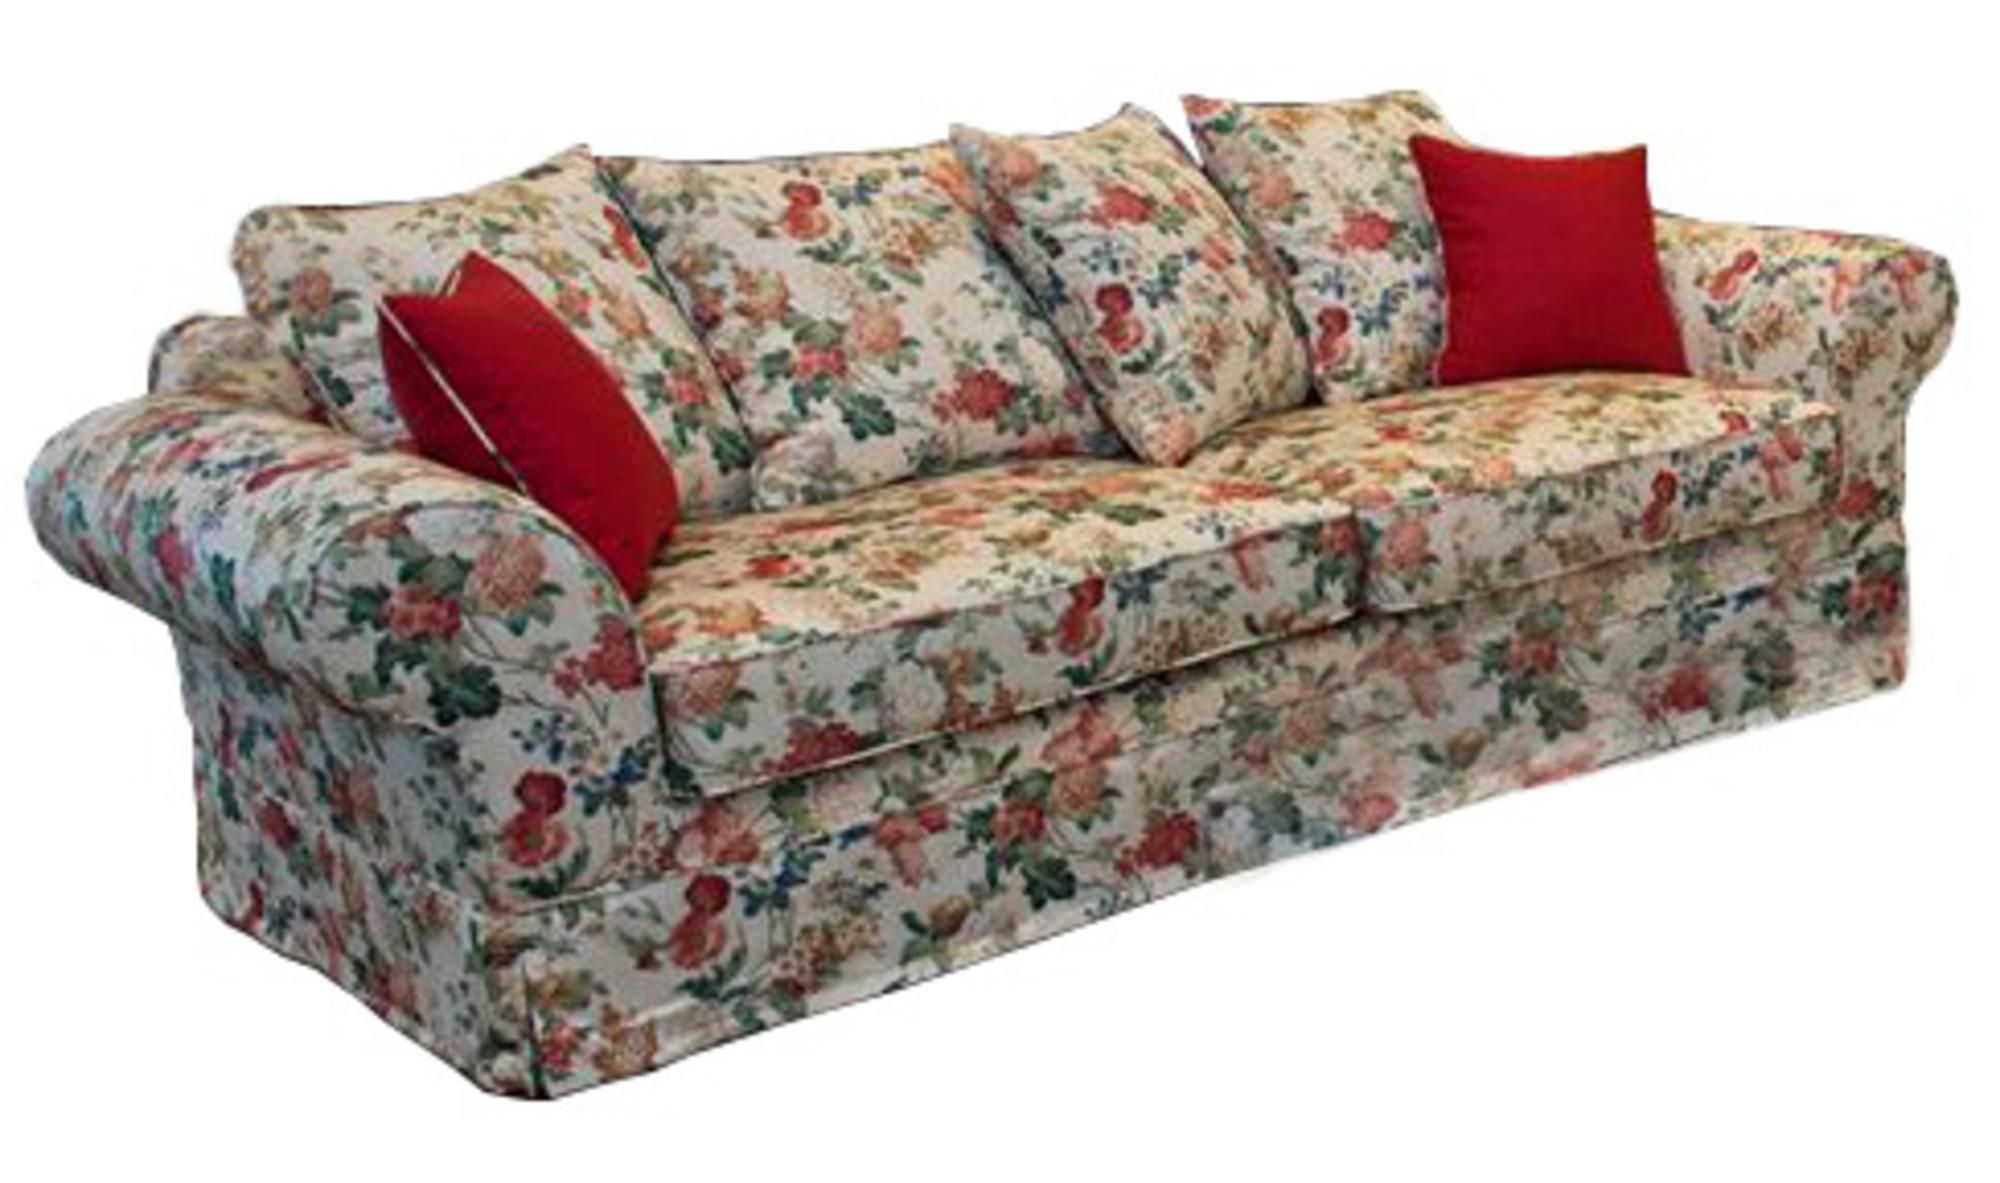 Pohovka HAMPTONS   Sconto Nábytek   Home decor, Furniture ...